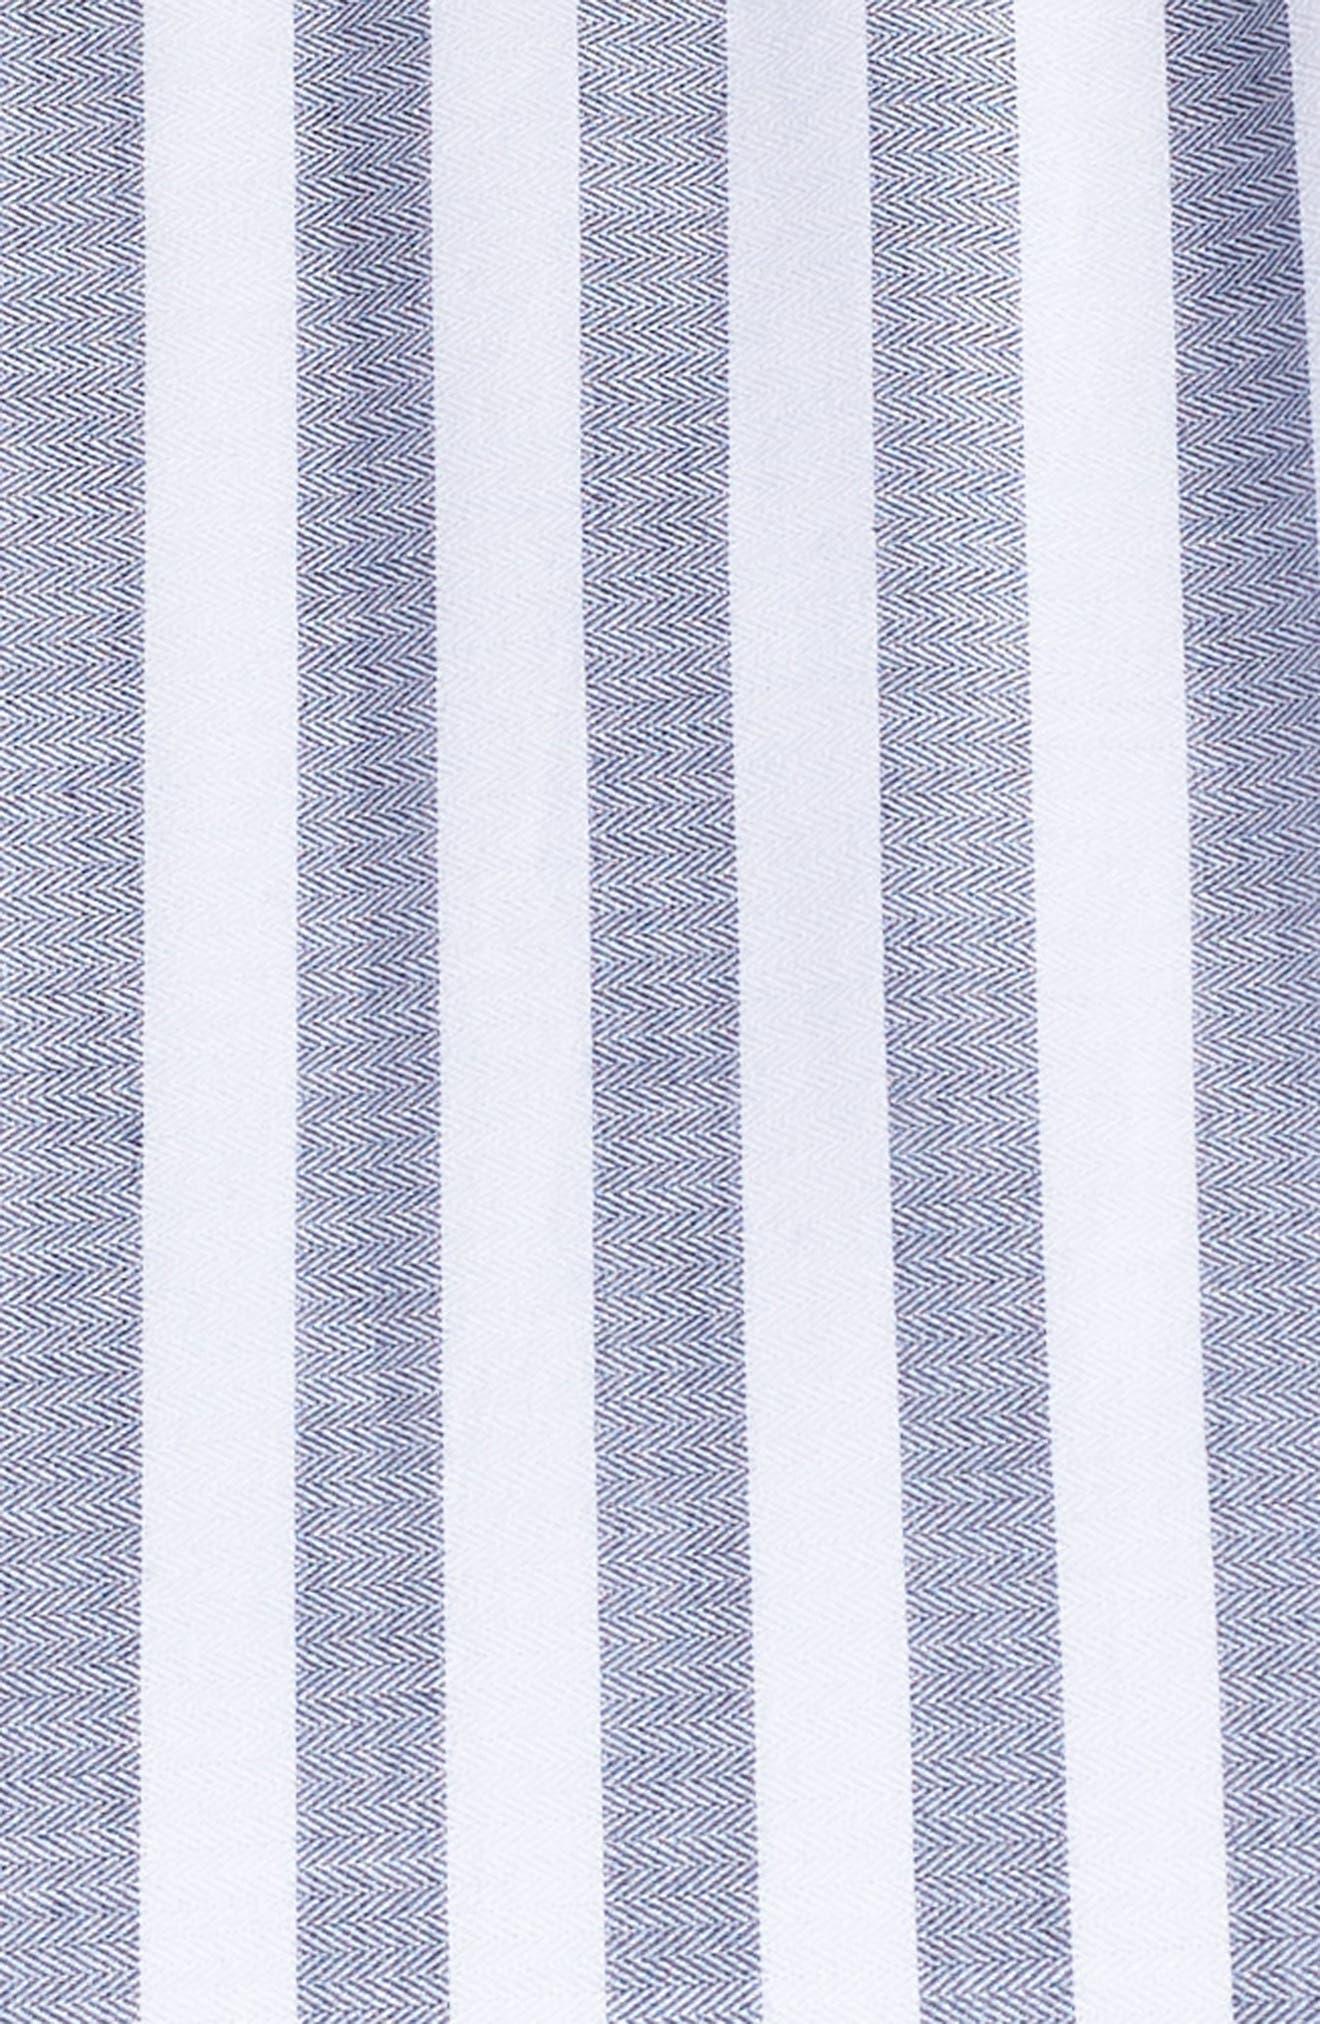 Tiered Stripe Halter Maxi Dress,                             Alternate thumbnail 6, color,                             410